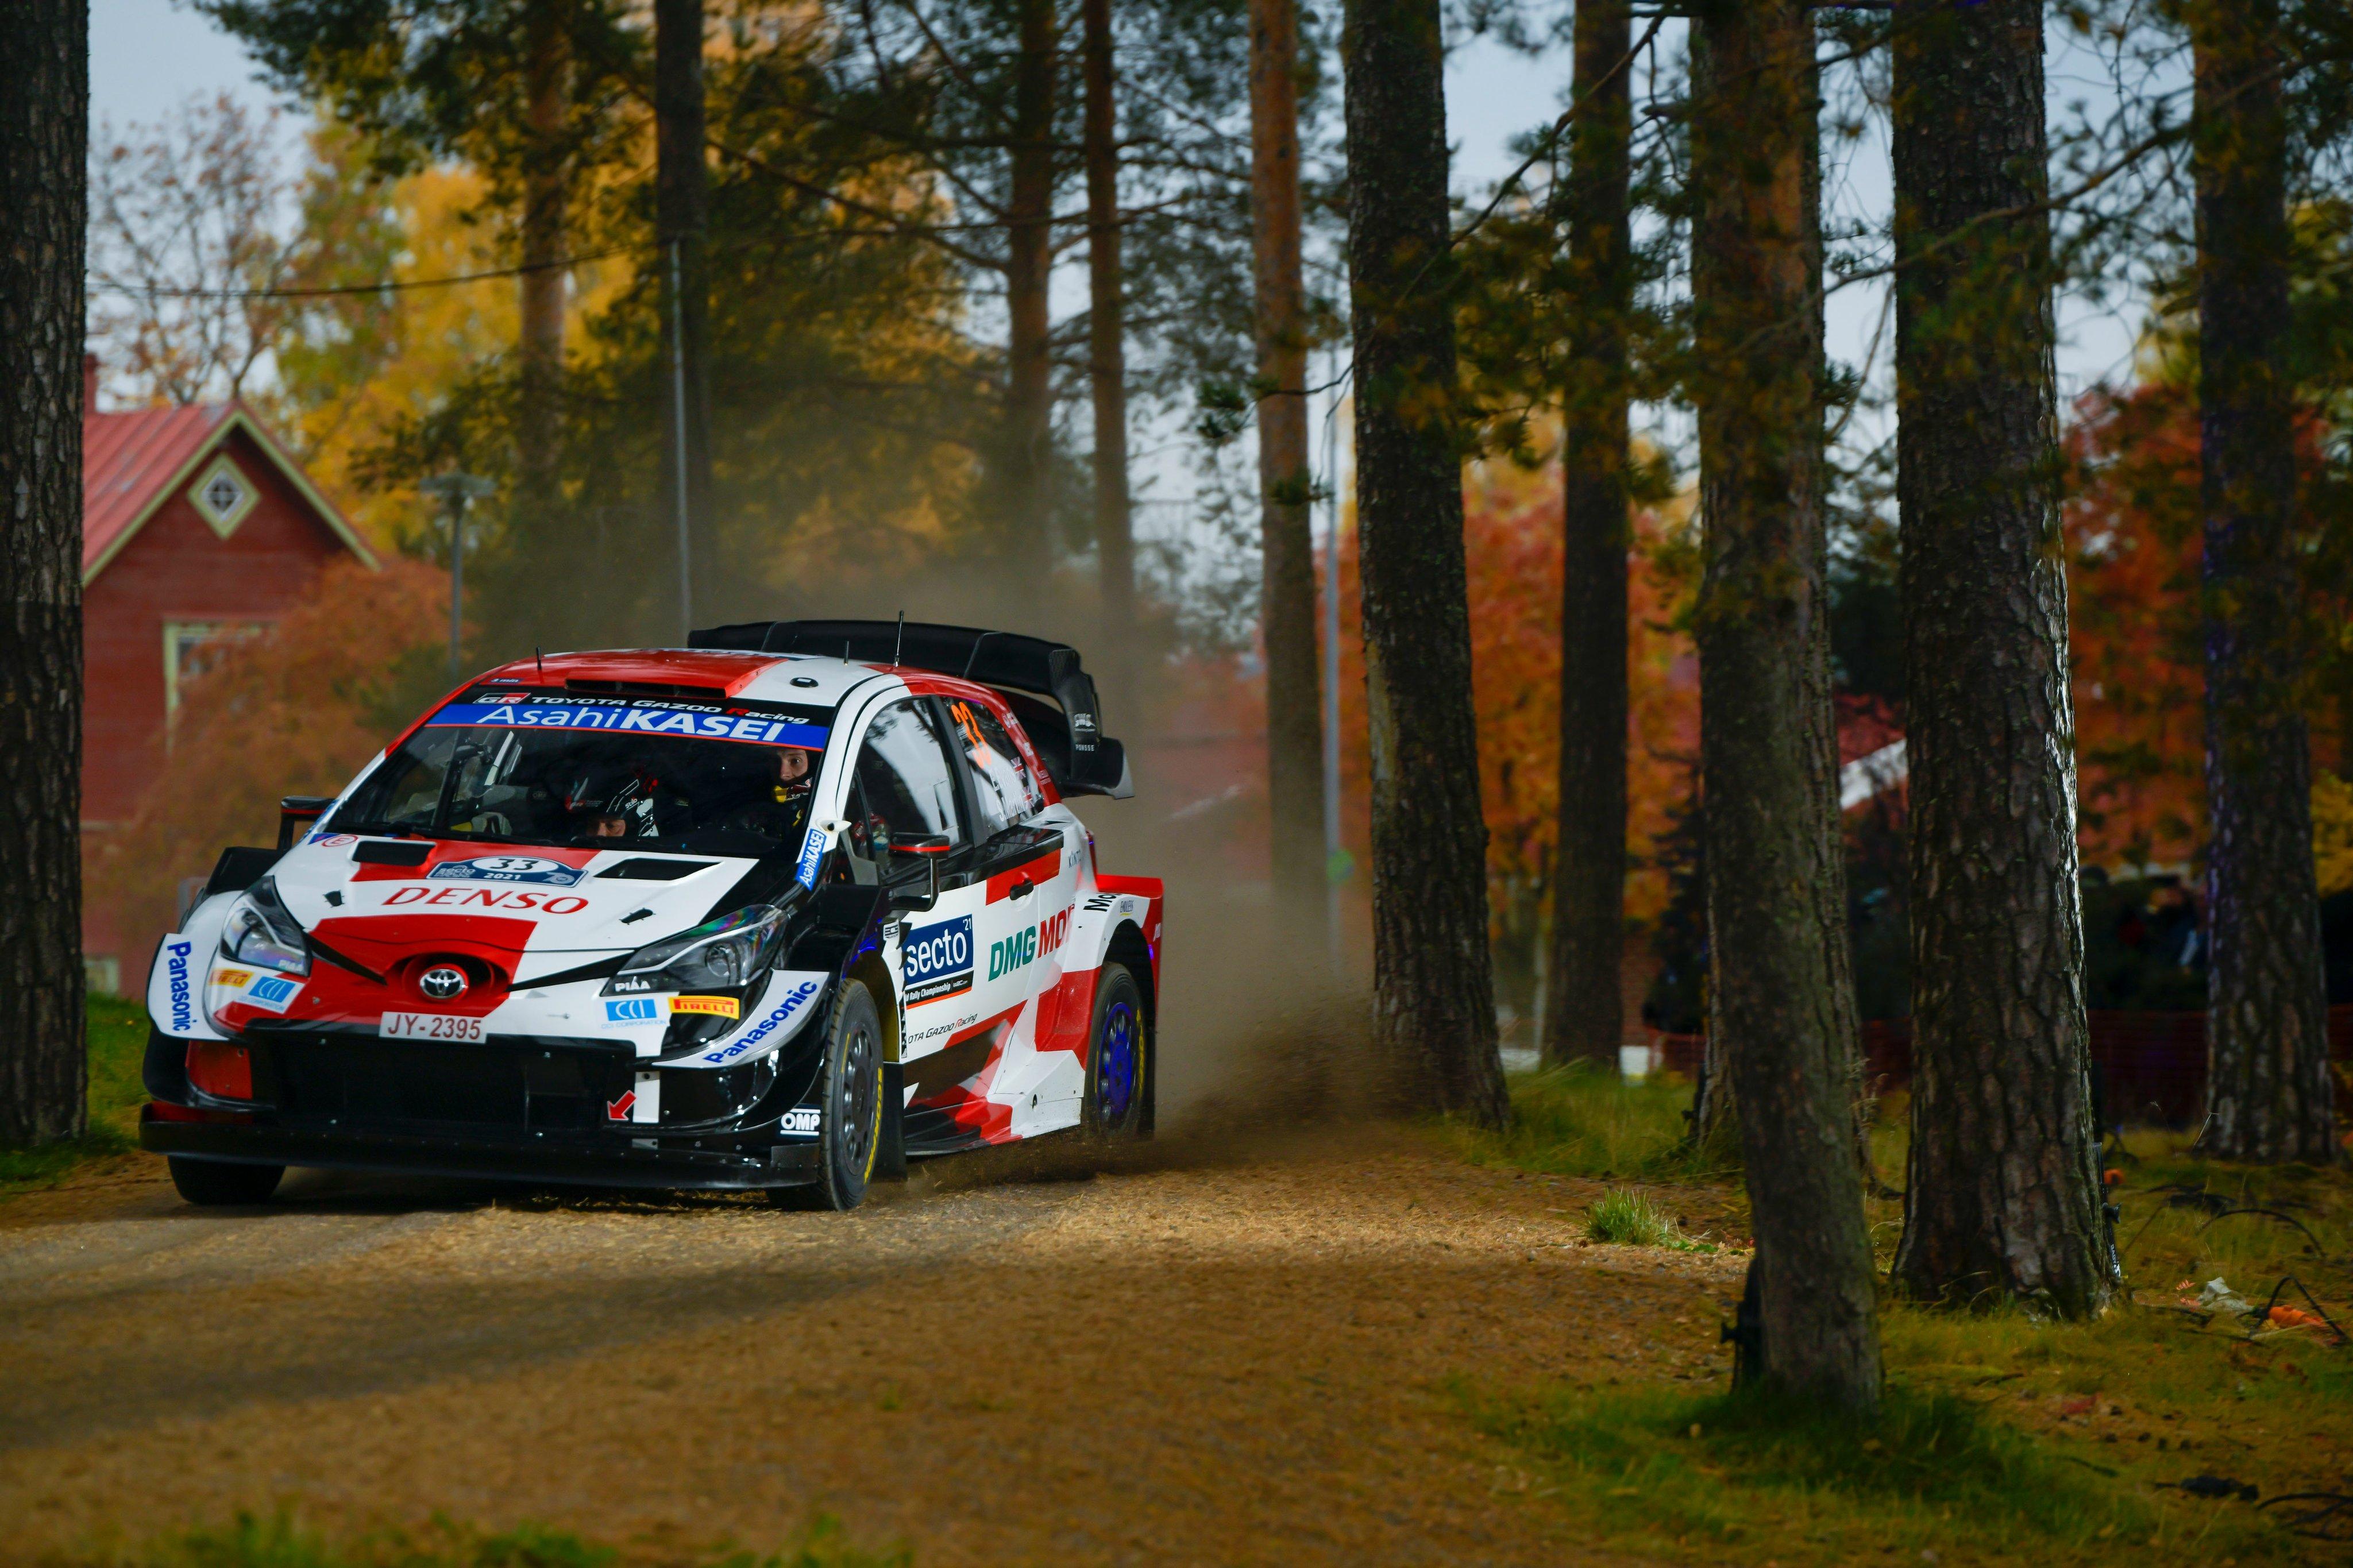 WRC: 70º SECTO Rally Finland [1-3 Octubre] - Página 3 FAtey9oXsAo2qqw?format=jpg&name=4096x4096